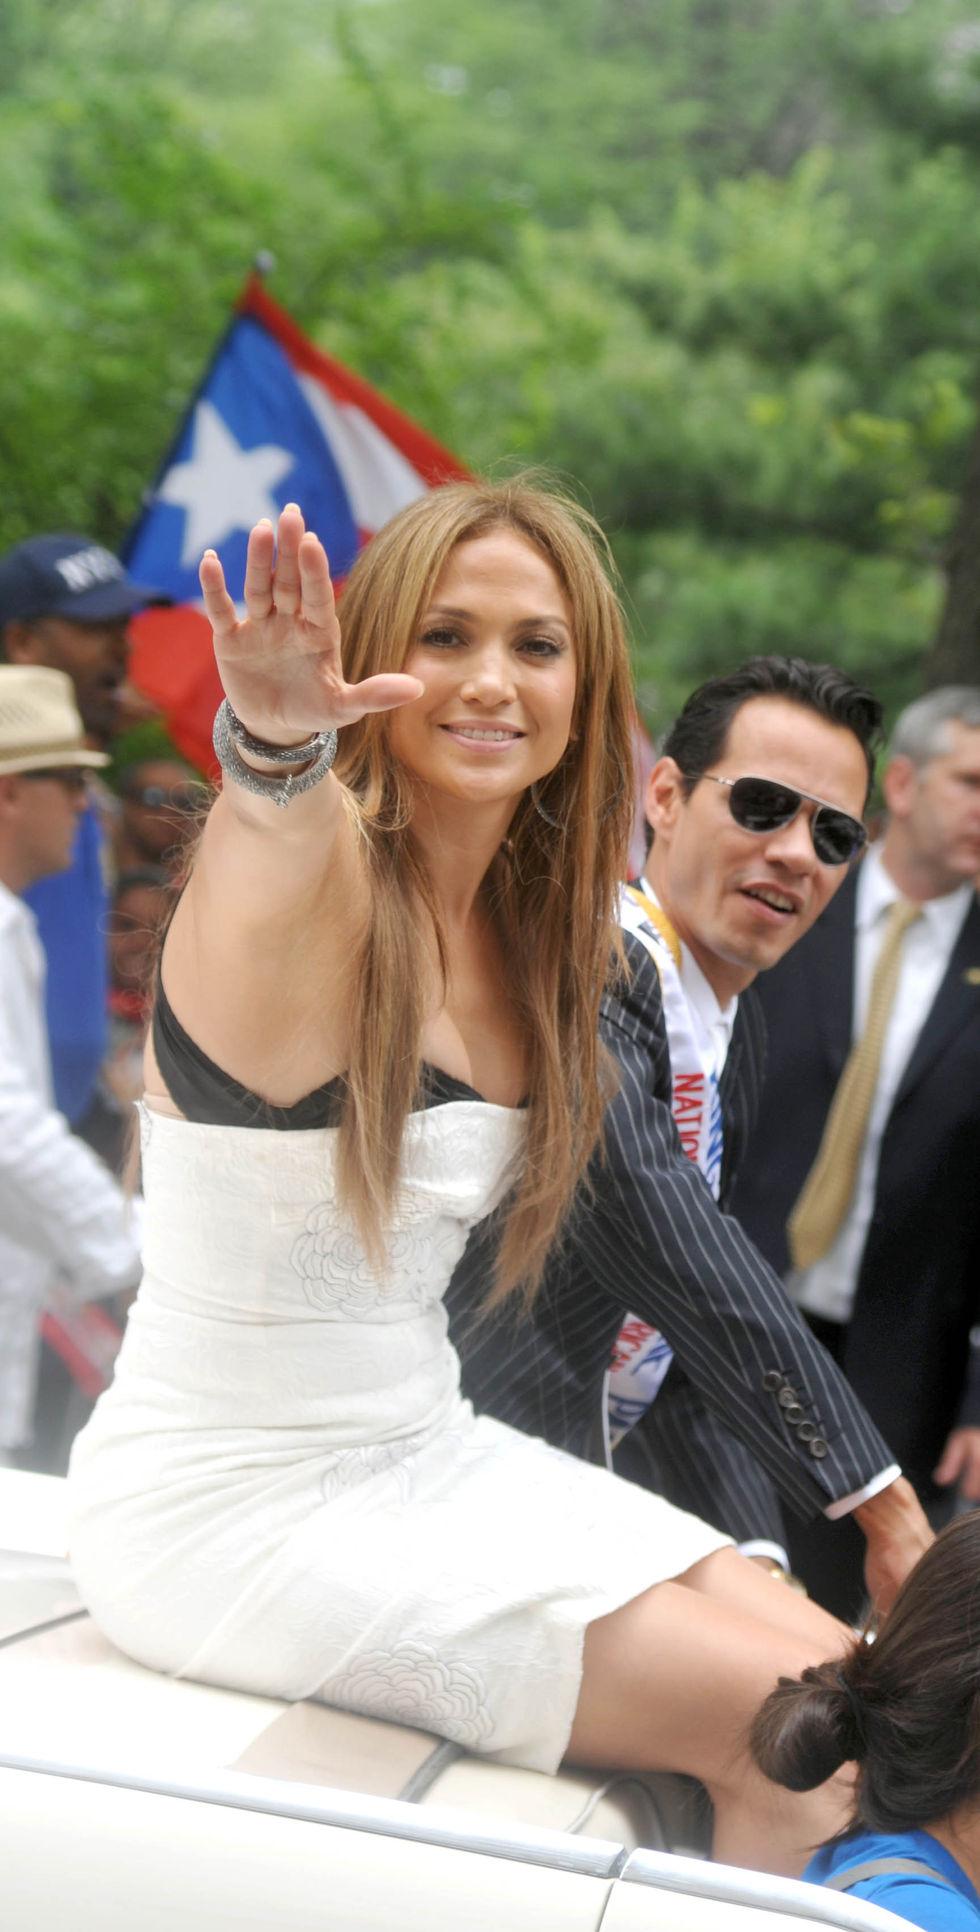 Jennifer Lopez 2010 : jennifer-lopez-at-puerto-rican-day-parade-jun-2010-02